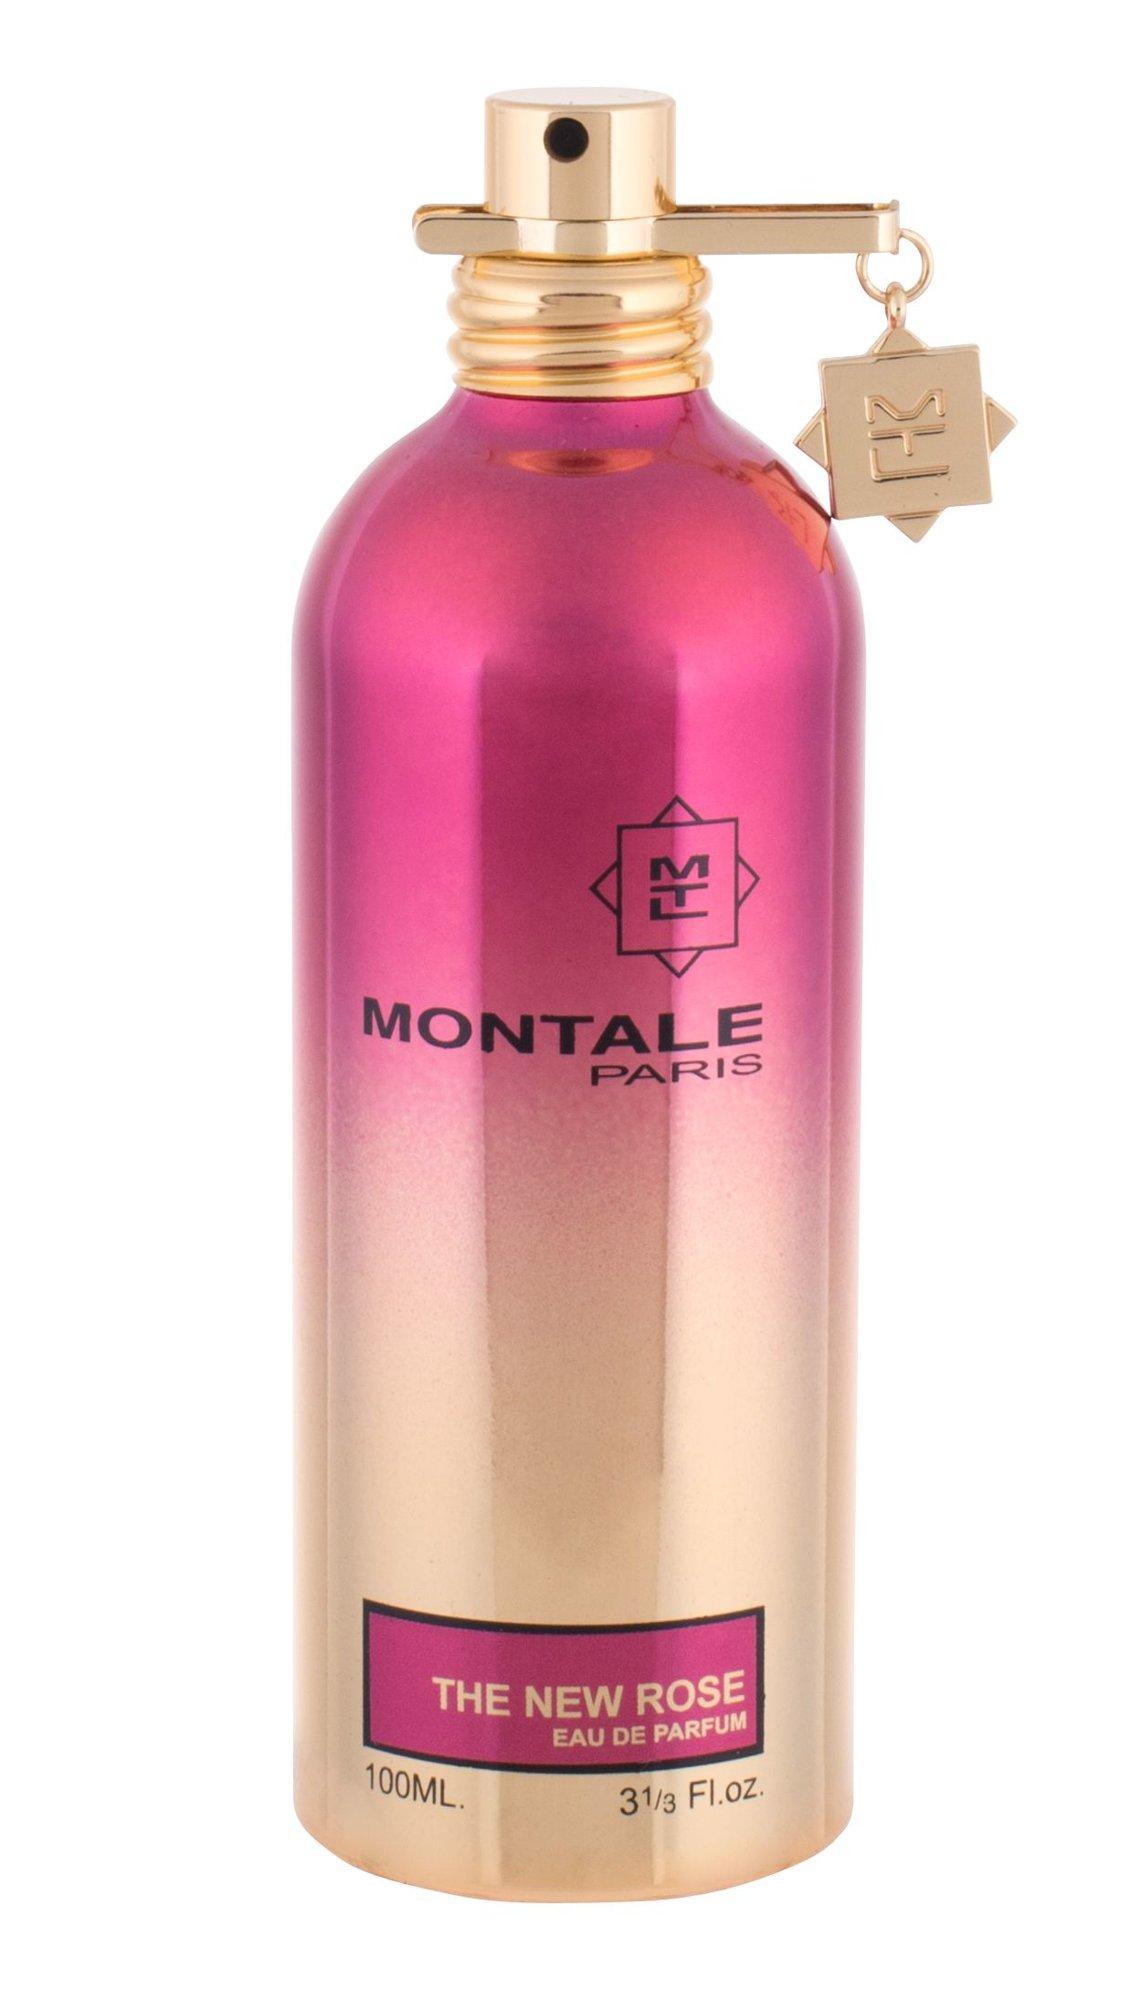 Montale Paris The New Rose EDP 100ml